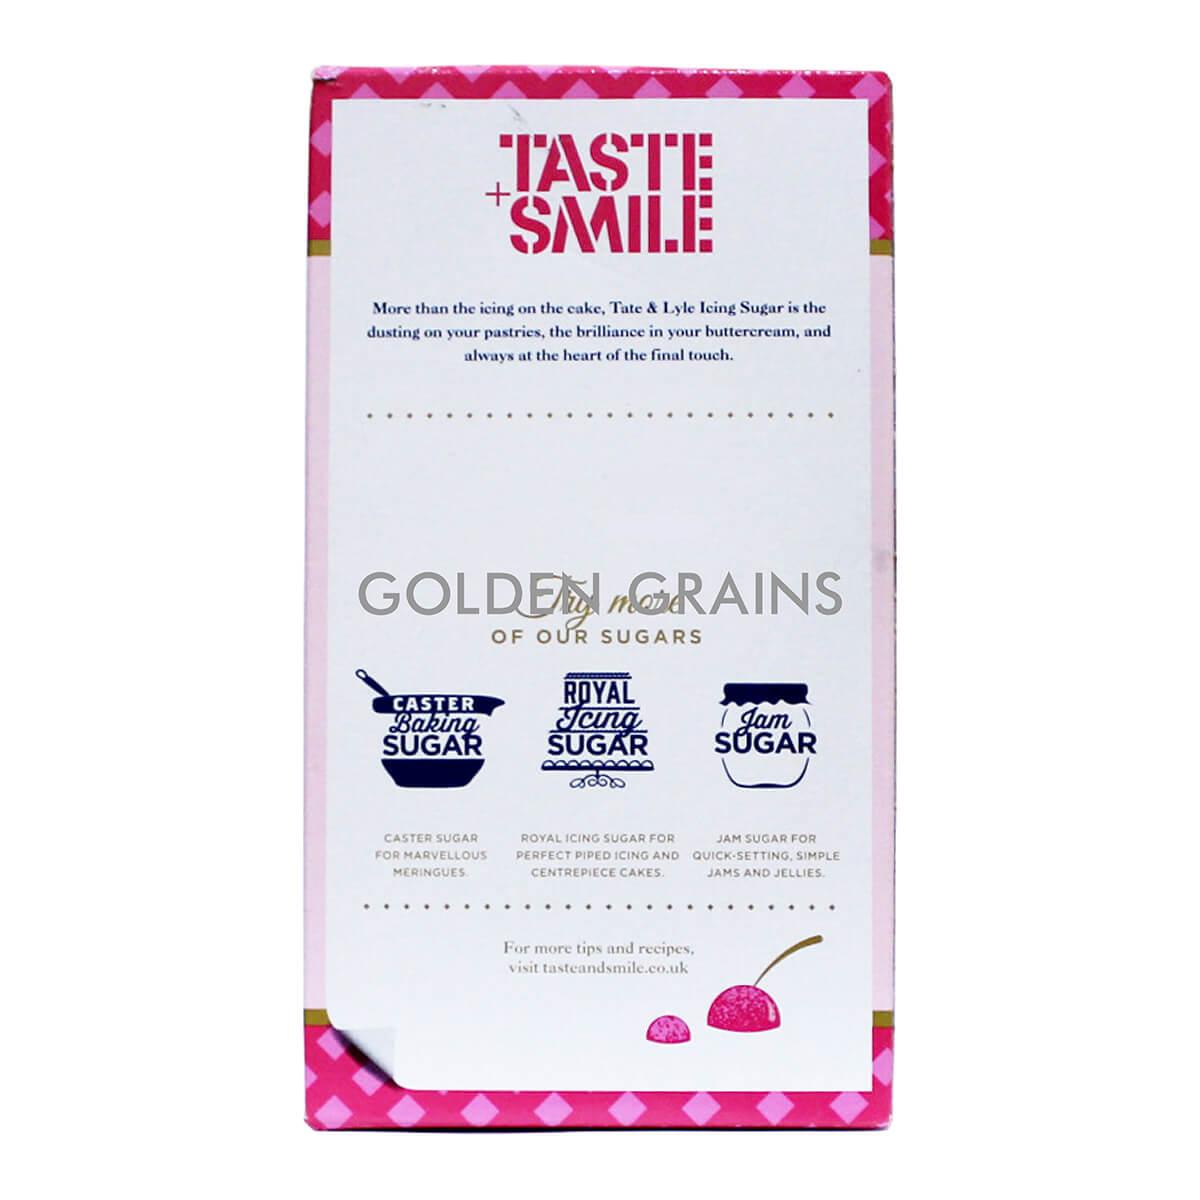 Golden Grains Tate & Lyle - Icing Sugar 500G - Back.jpg